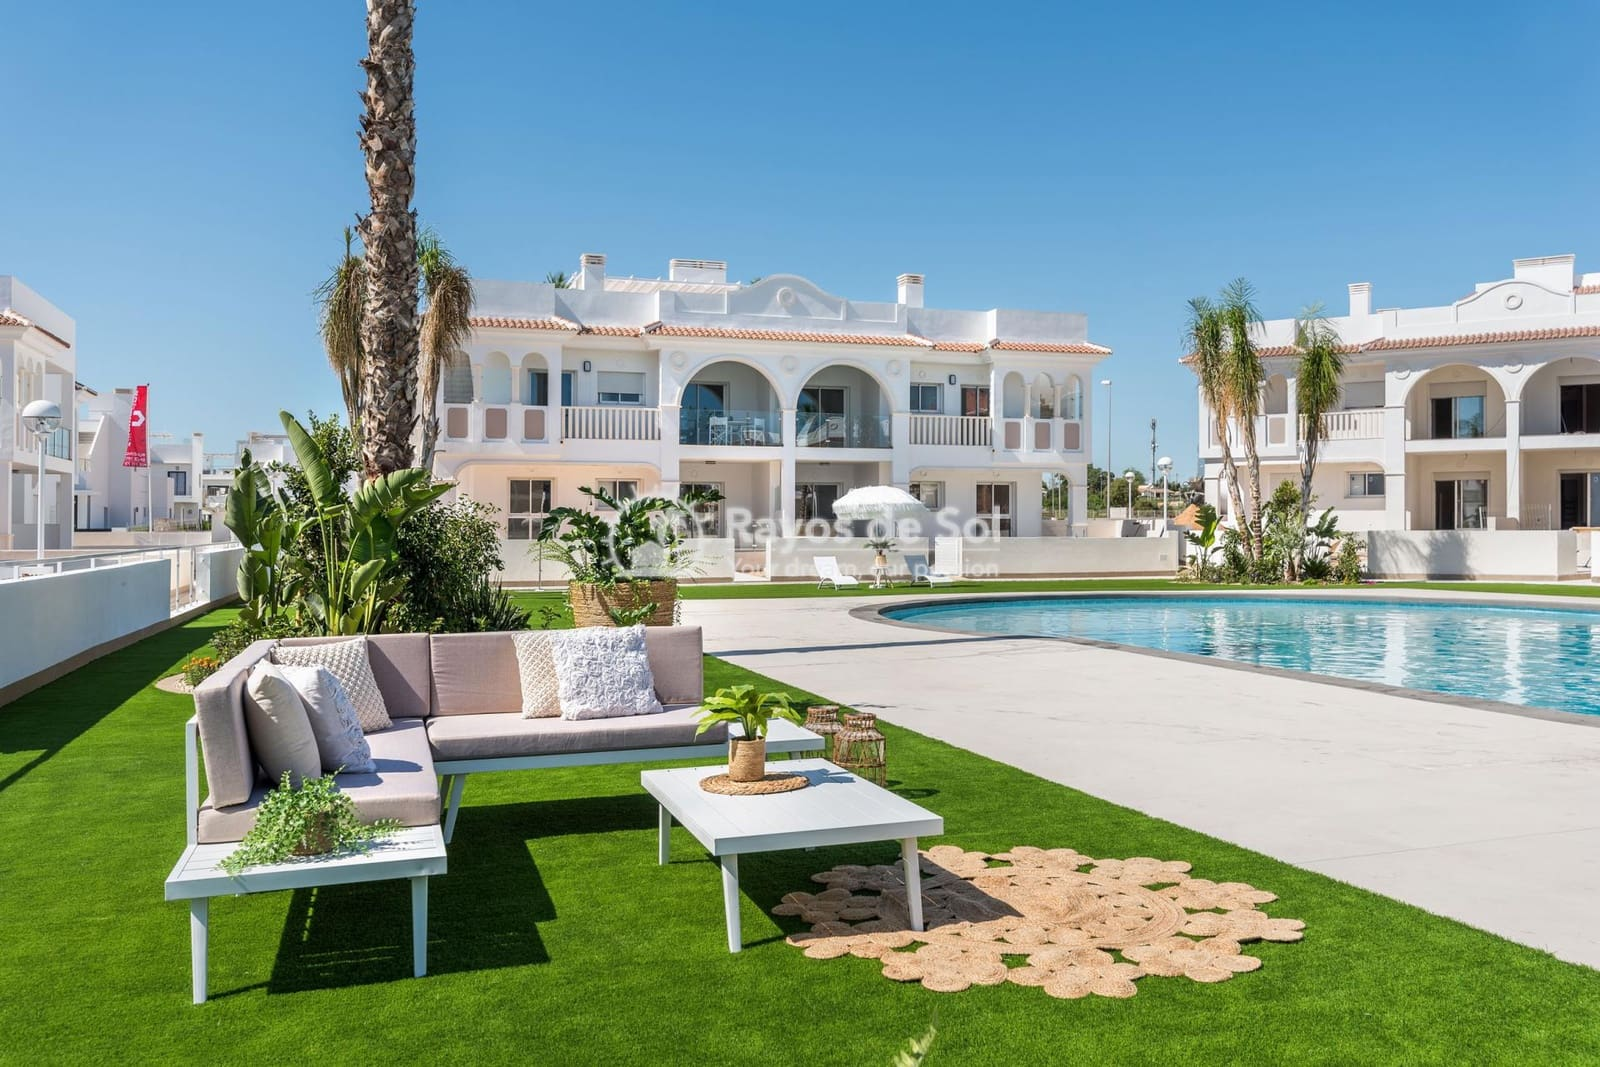 3 bedroom Apartment for sale in Ciudad Quesada with pool - € 265,000 (Ref: 5394980)